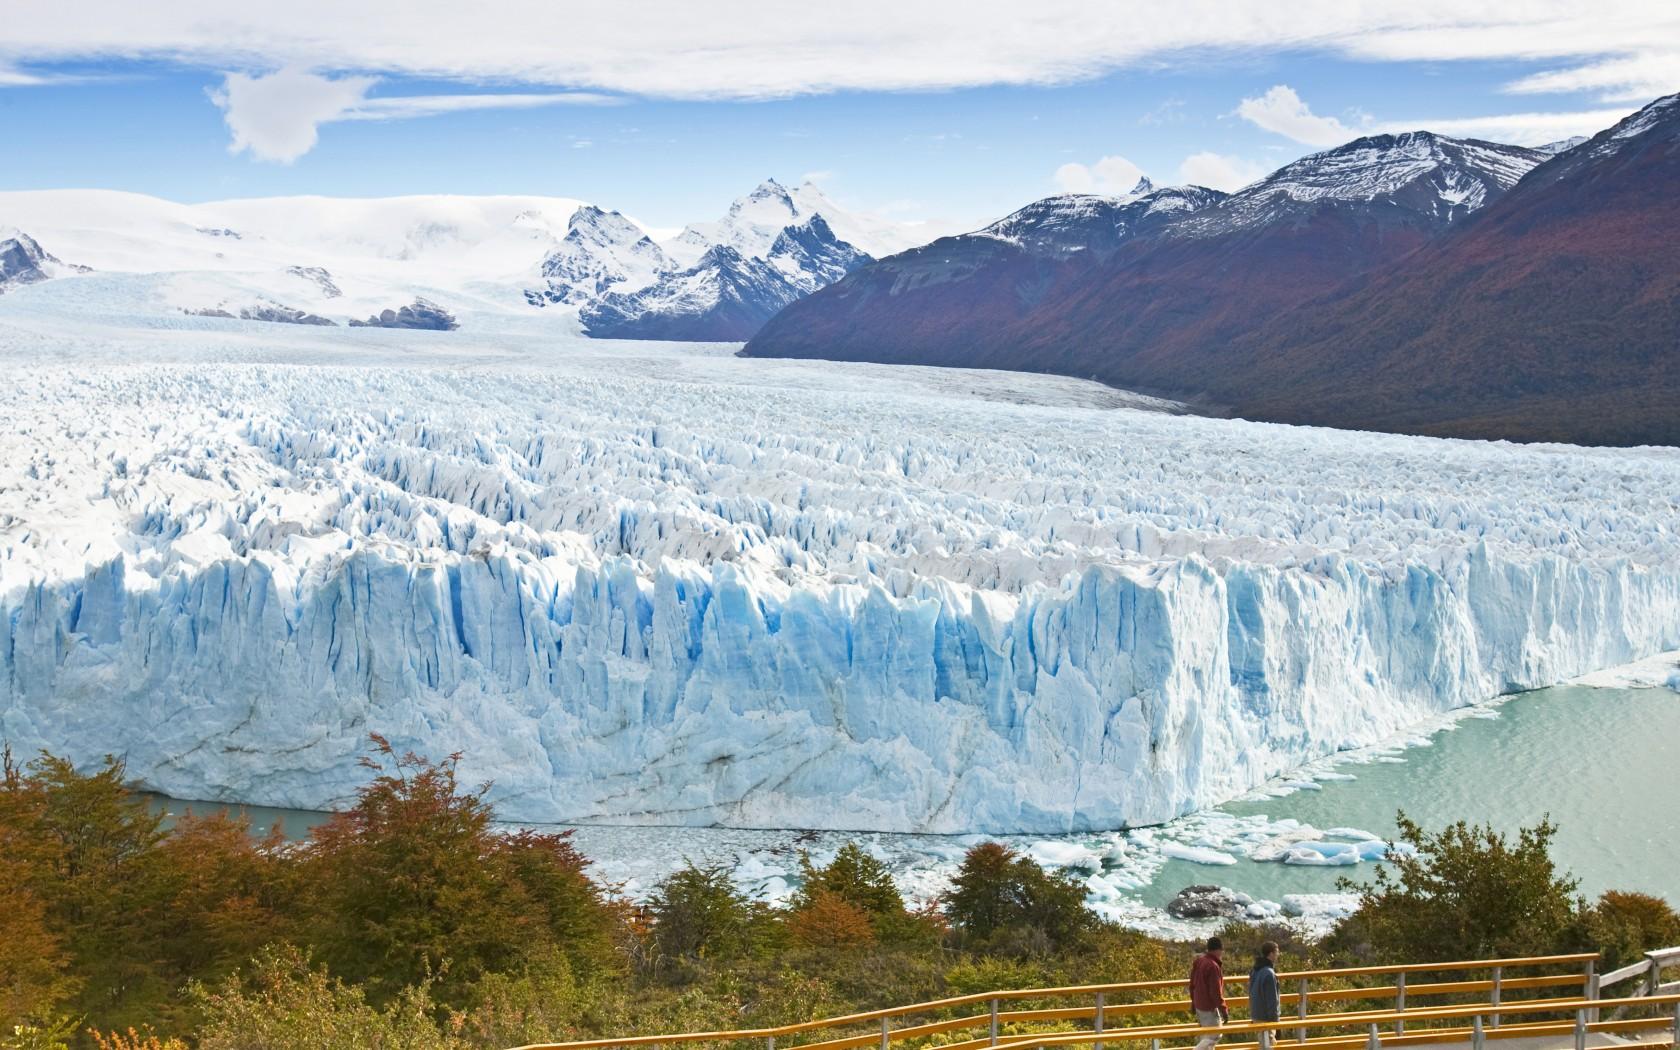 18_Patagonia_90044561-1680x1050